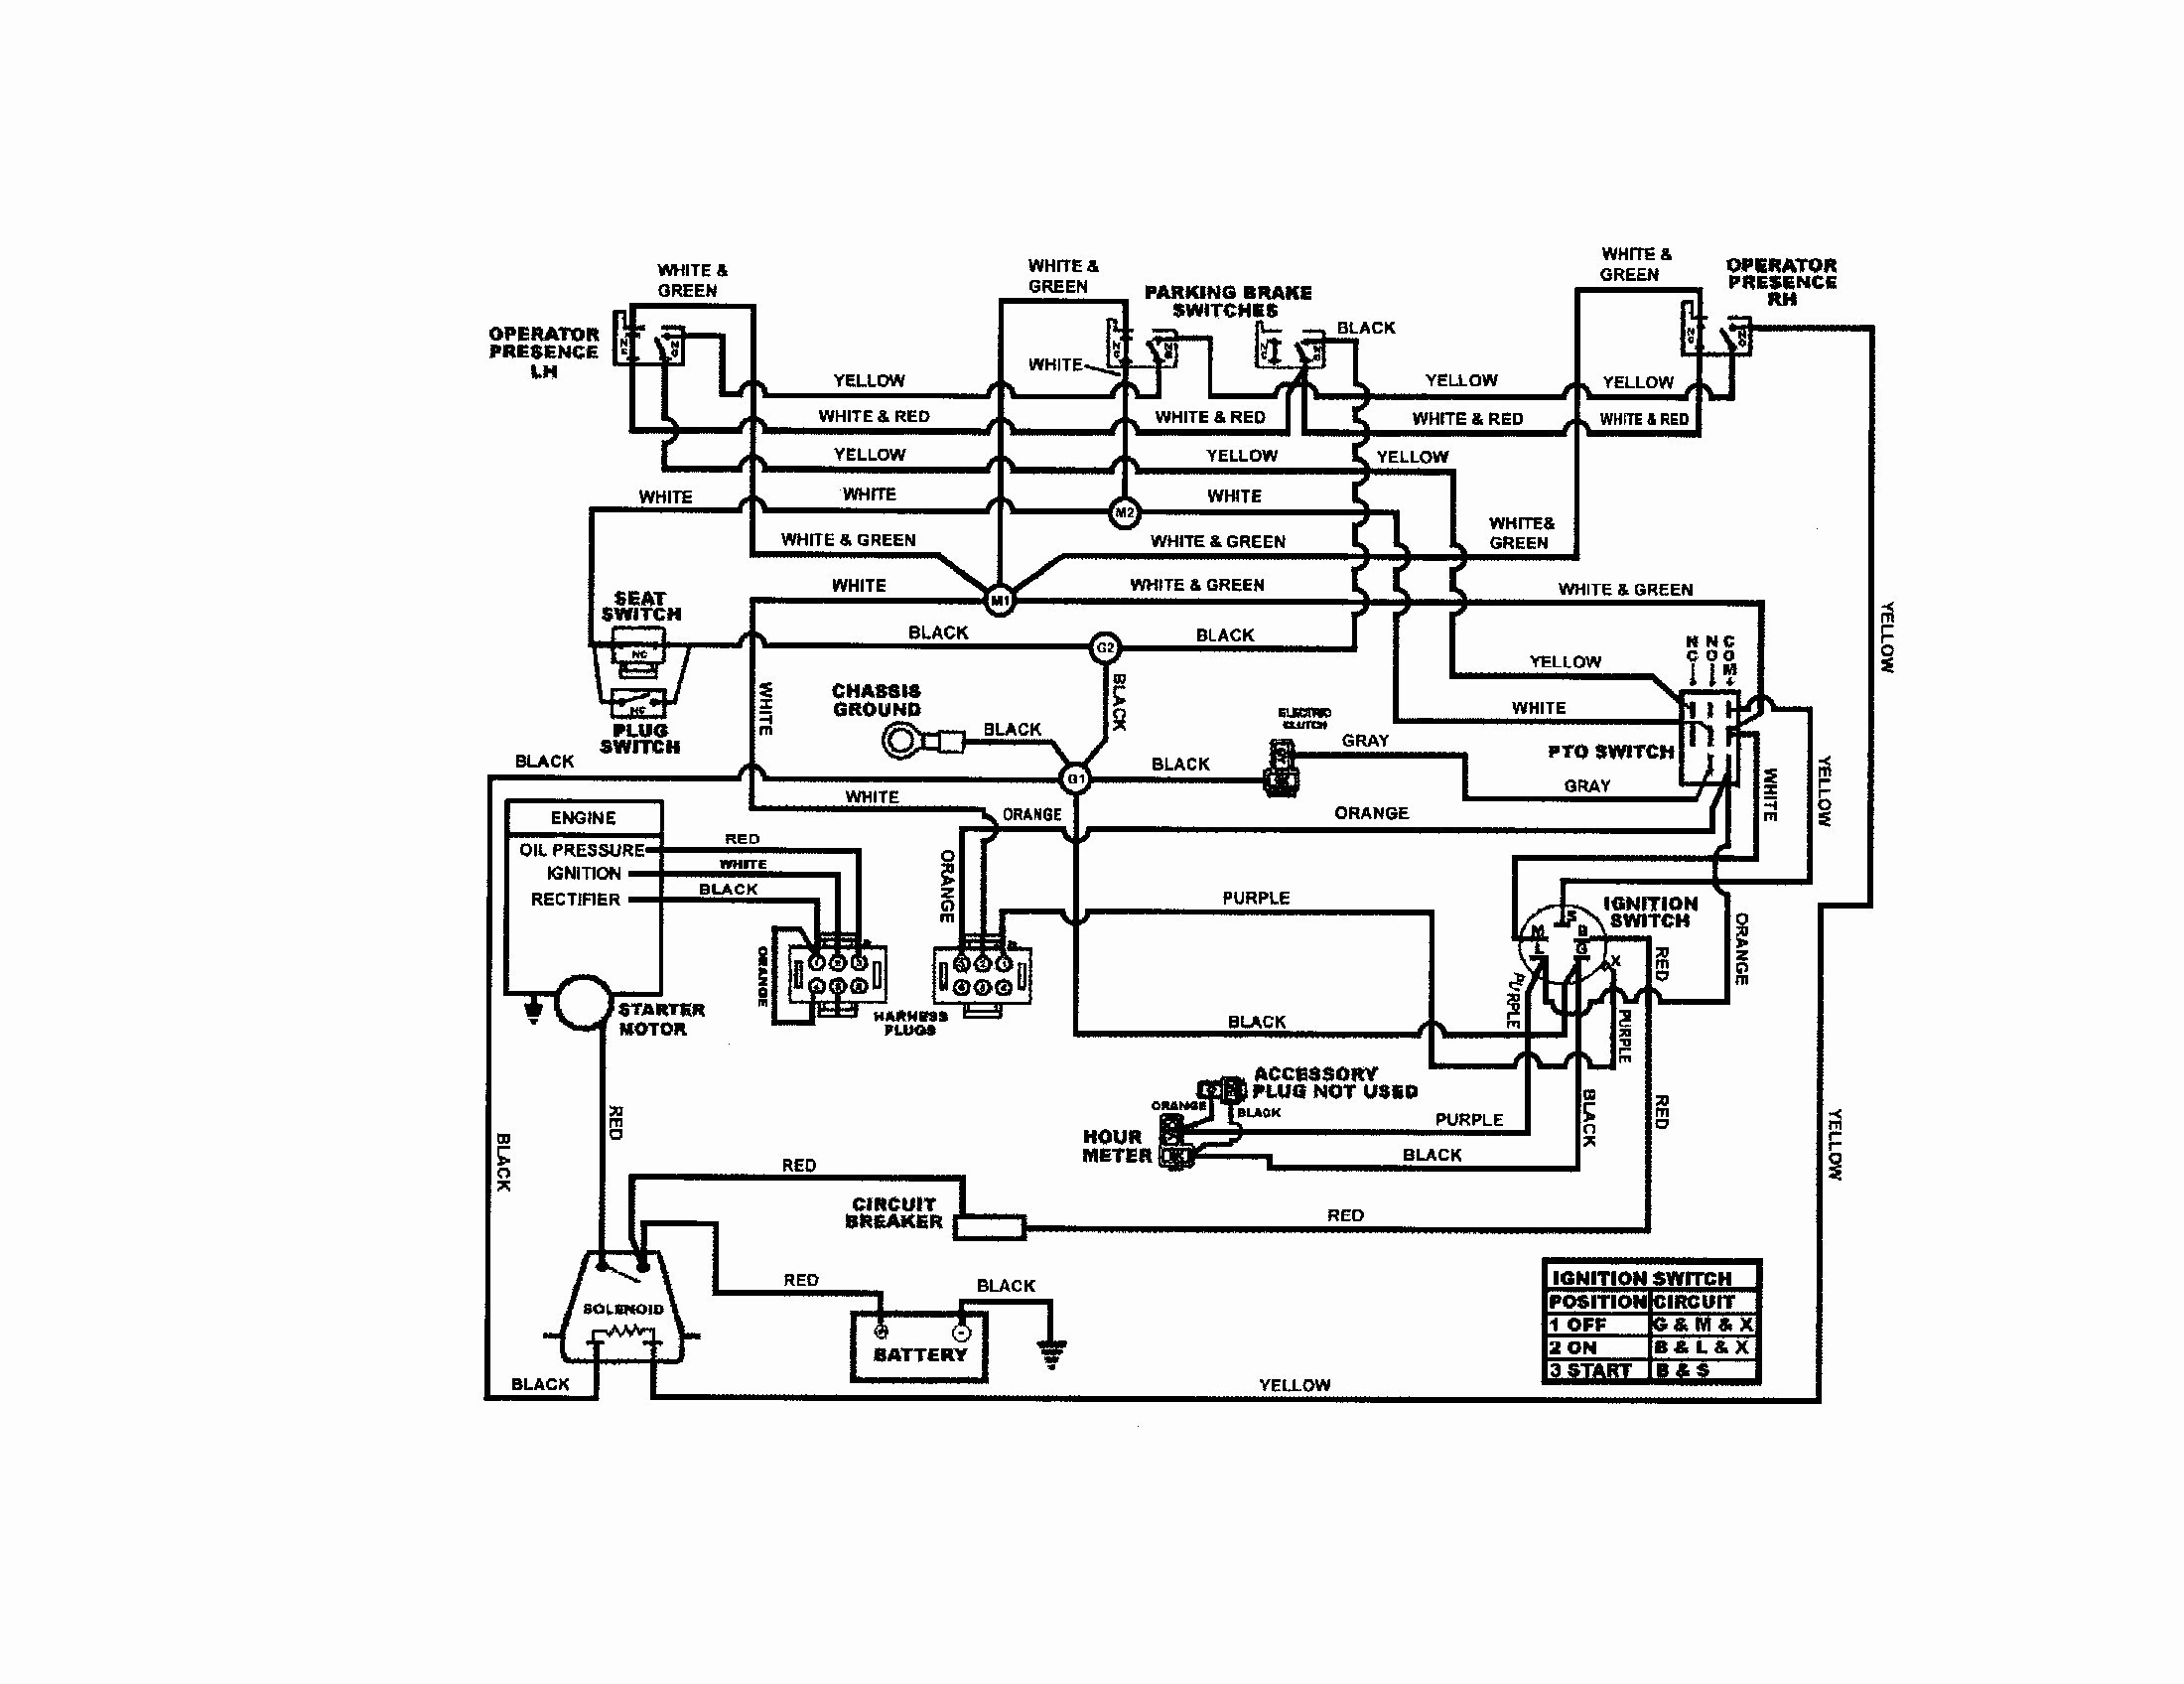 Kohler Ignition Switch Wiring Diagram - General Wiring Diagram